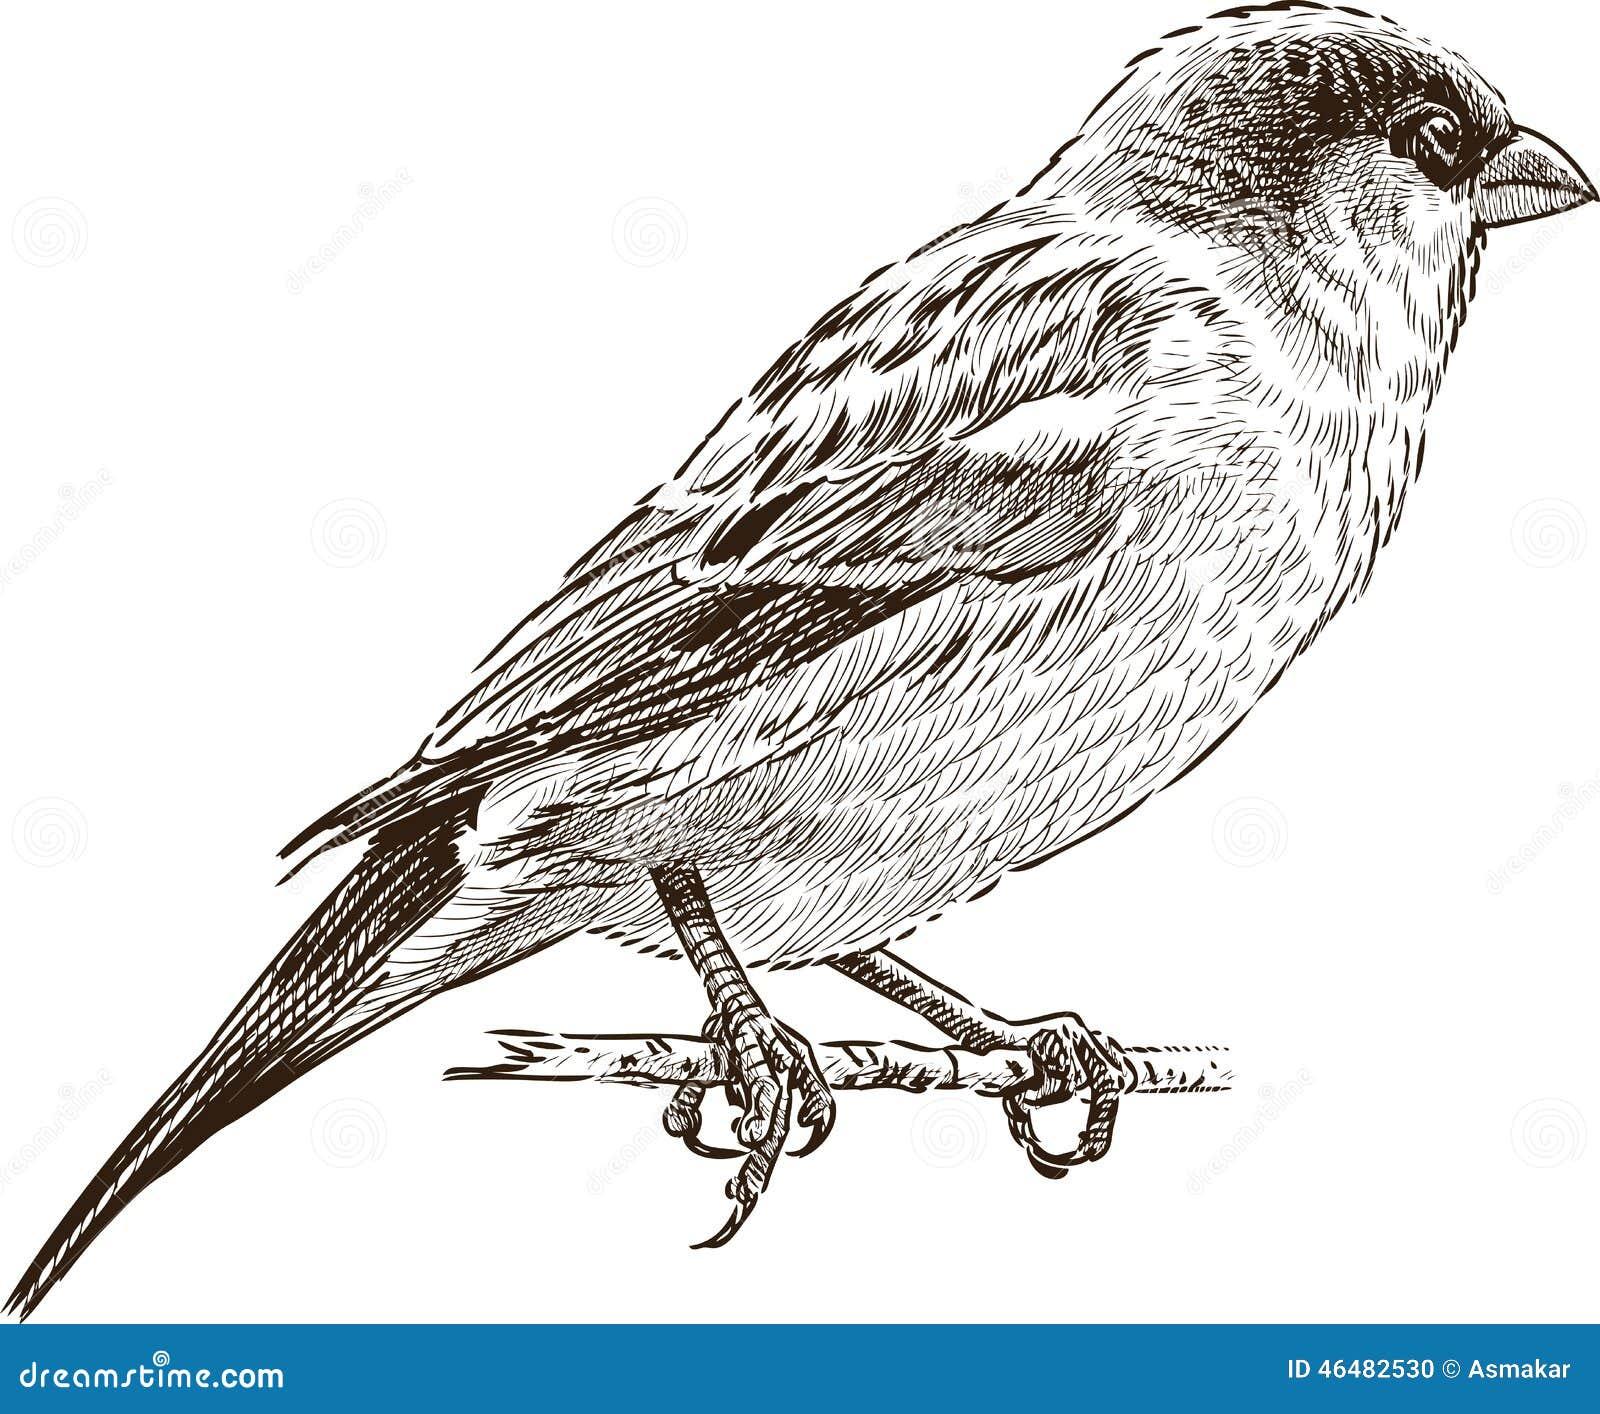 Sparrow on branch stock vector. Illustration of legs ...